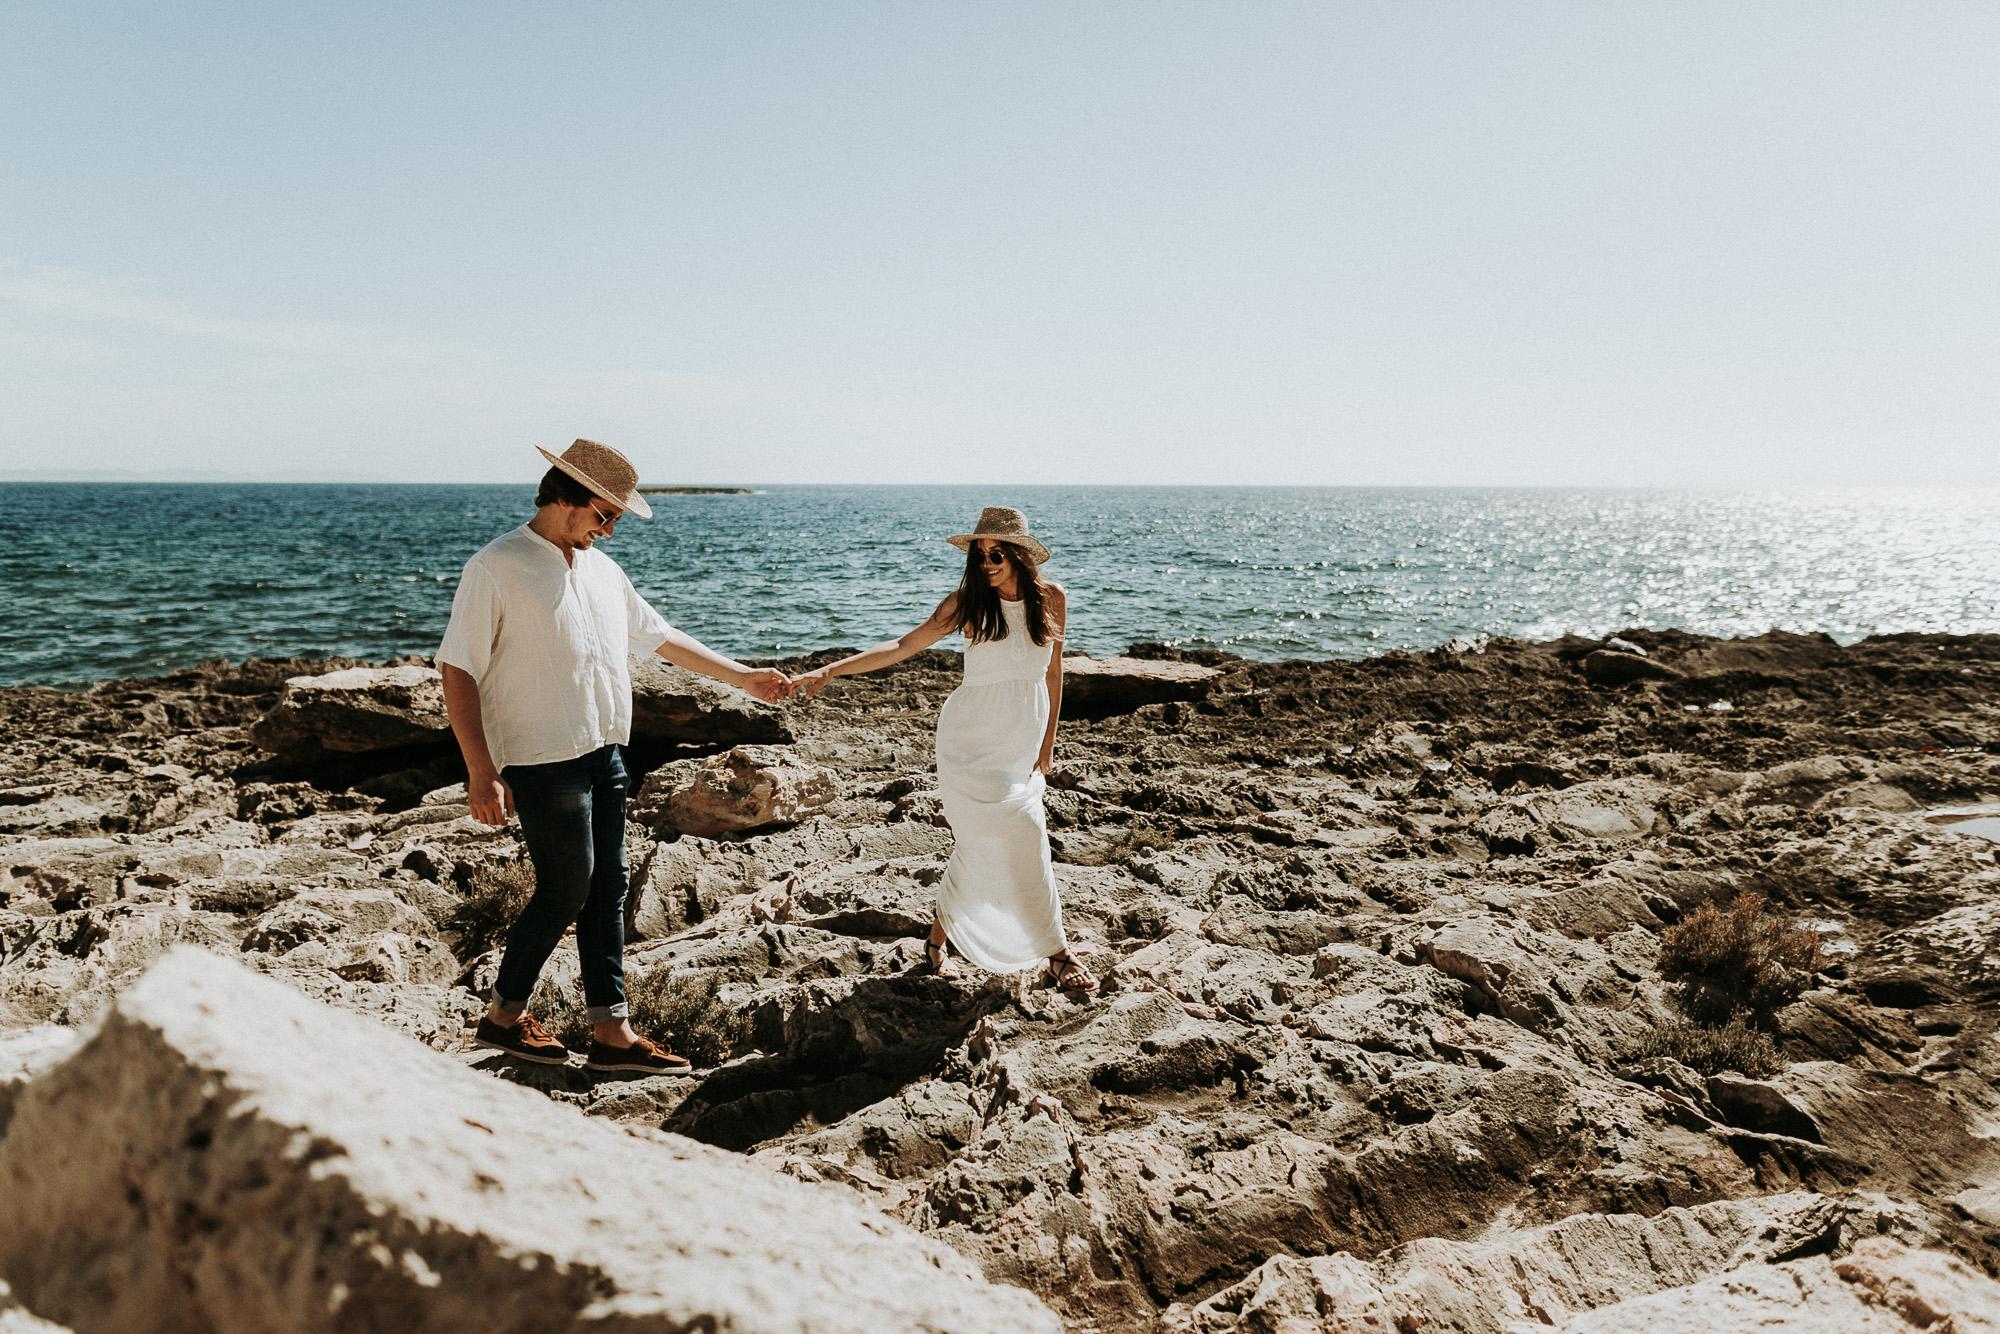 DanielaMarquardtPhotography_wedding_elopement_mallorca_spain_stjordi_sessalines_marinaandxavi349